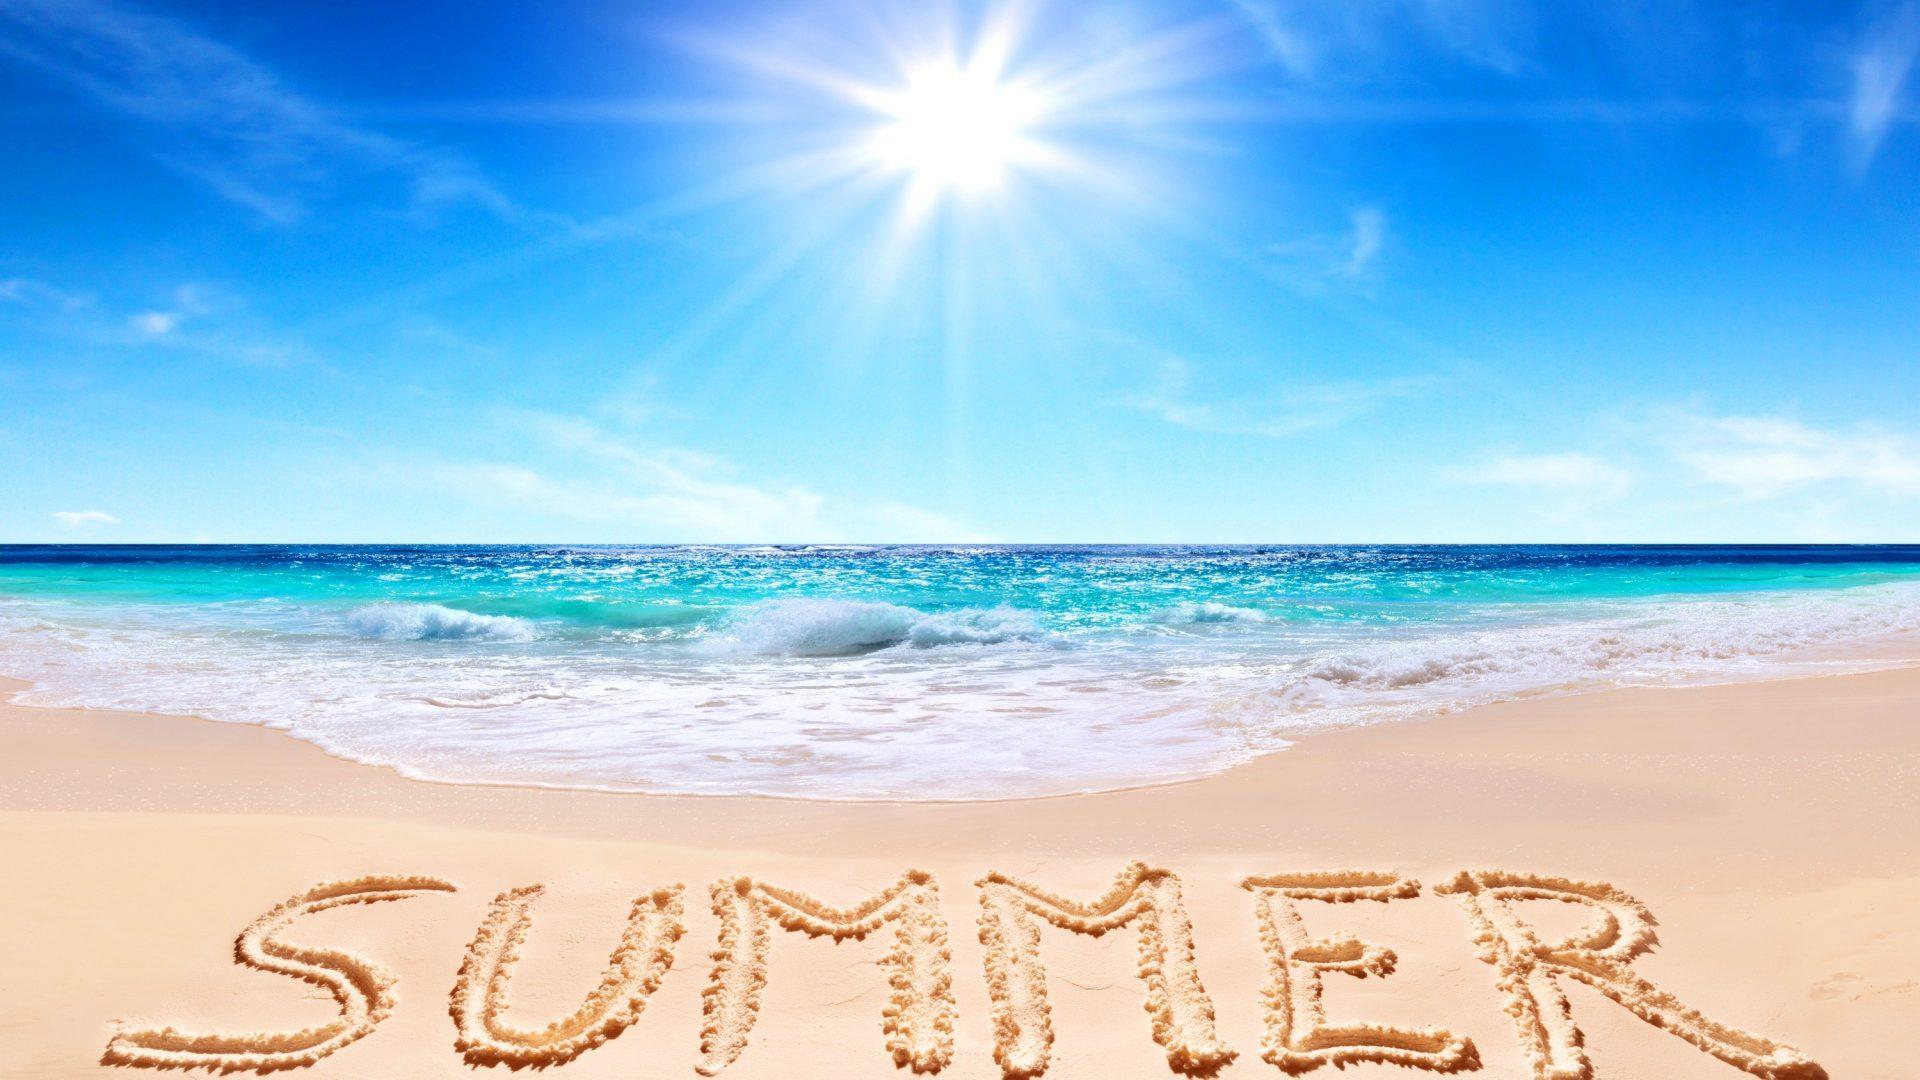 beaches-coast-water-island-isle-nature-sunshine-shore-sea-summer-summertime-paradise-ocean-sun-waves-sky-vacation-tropical-beach-holidays-wallpaper-images-1920x1080.jpg